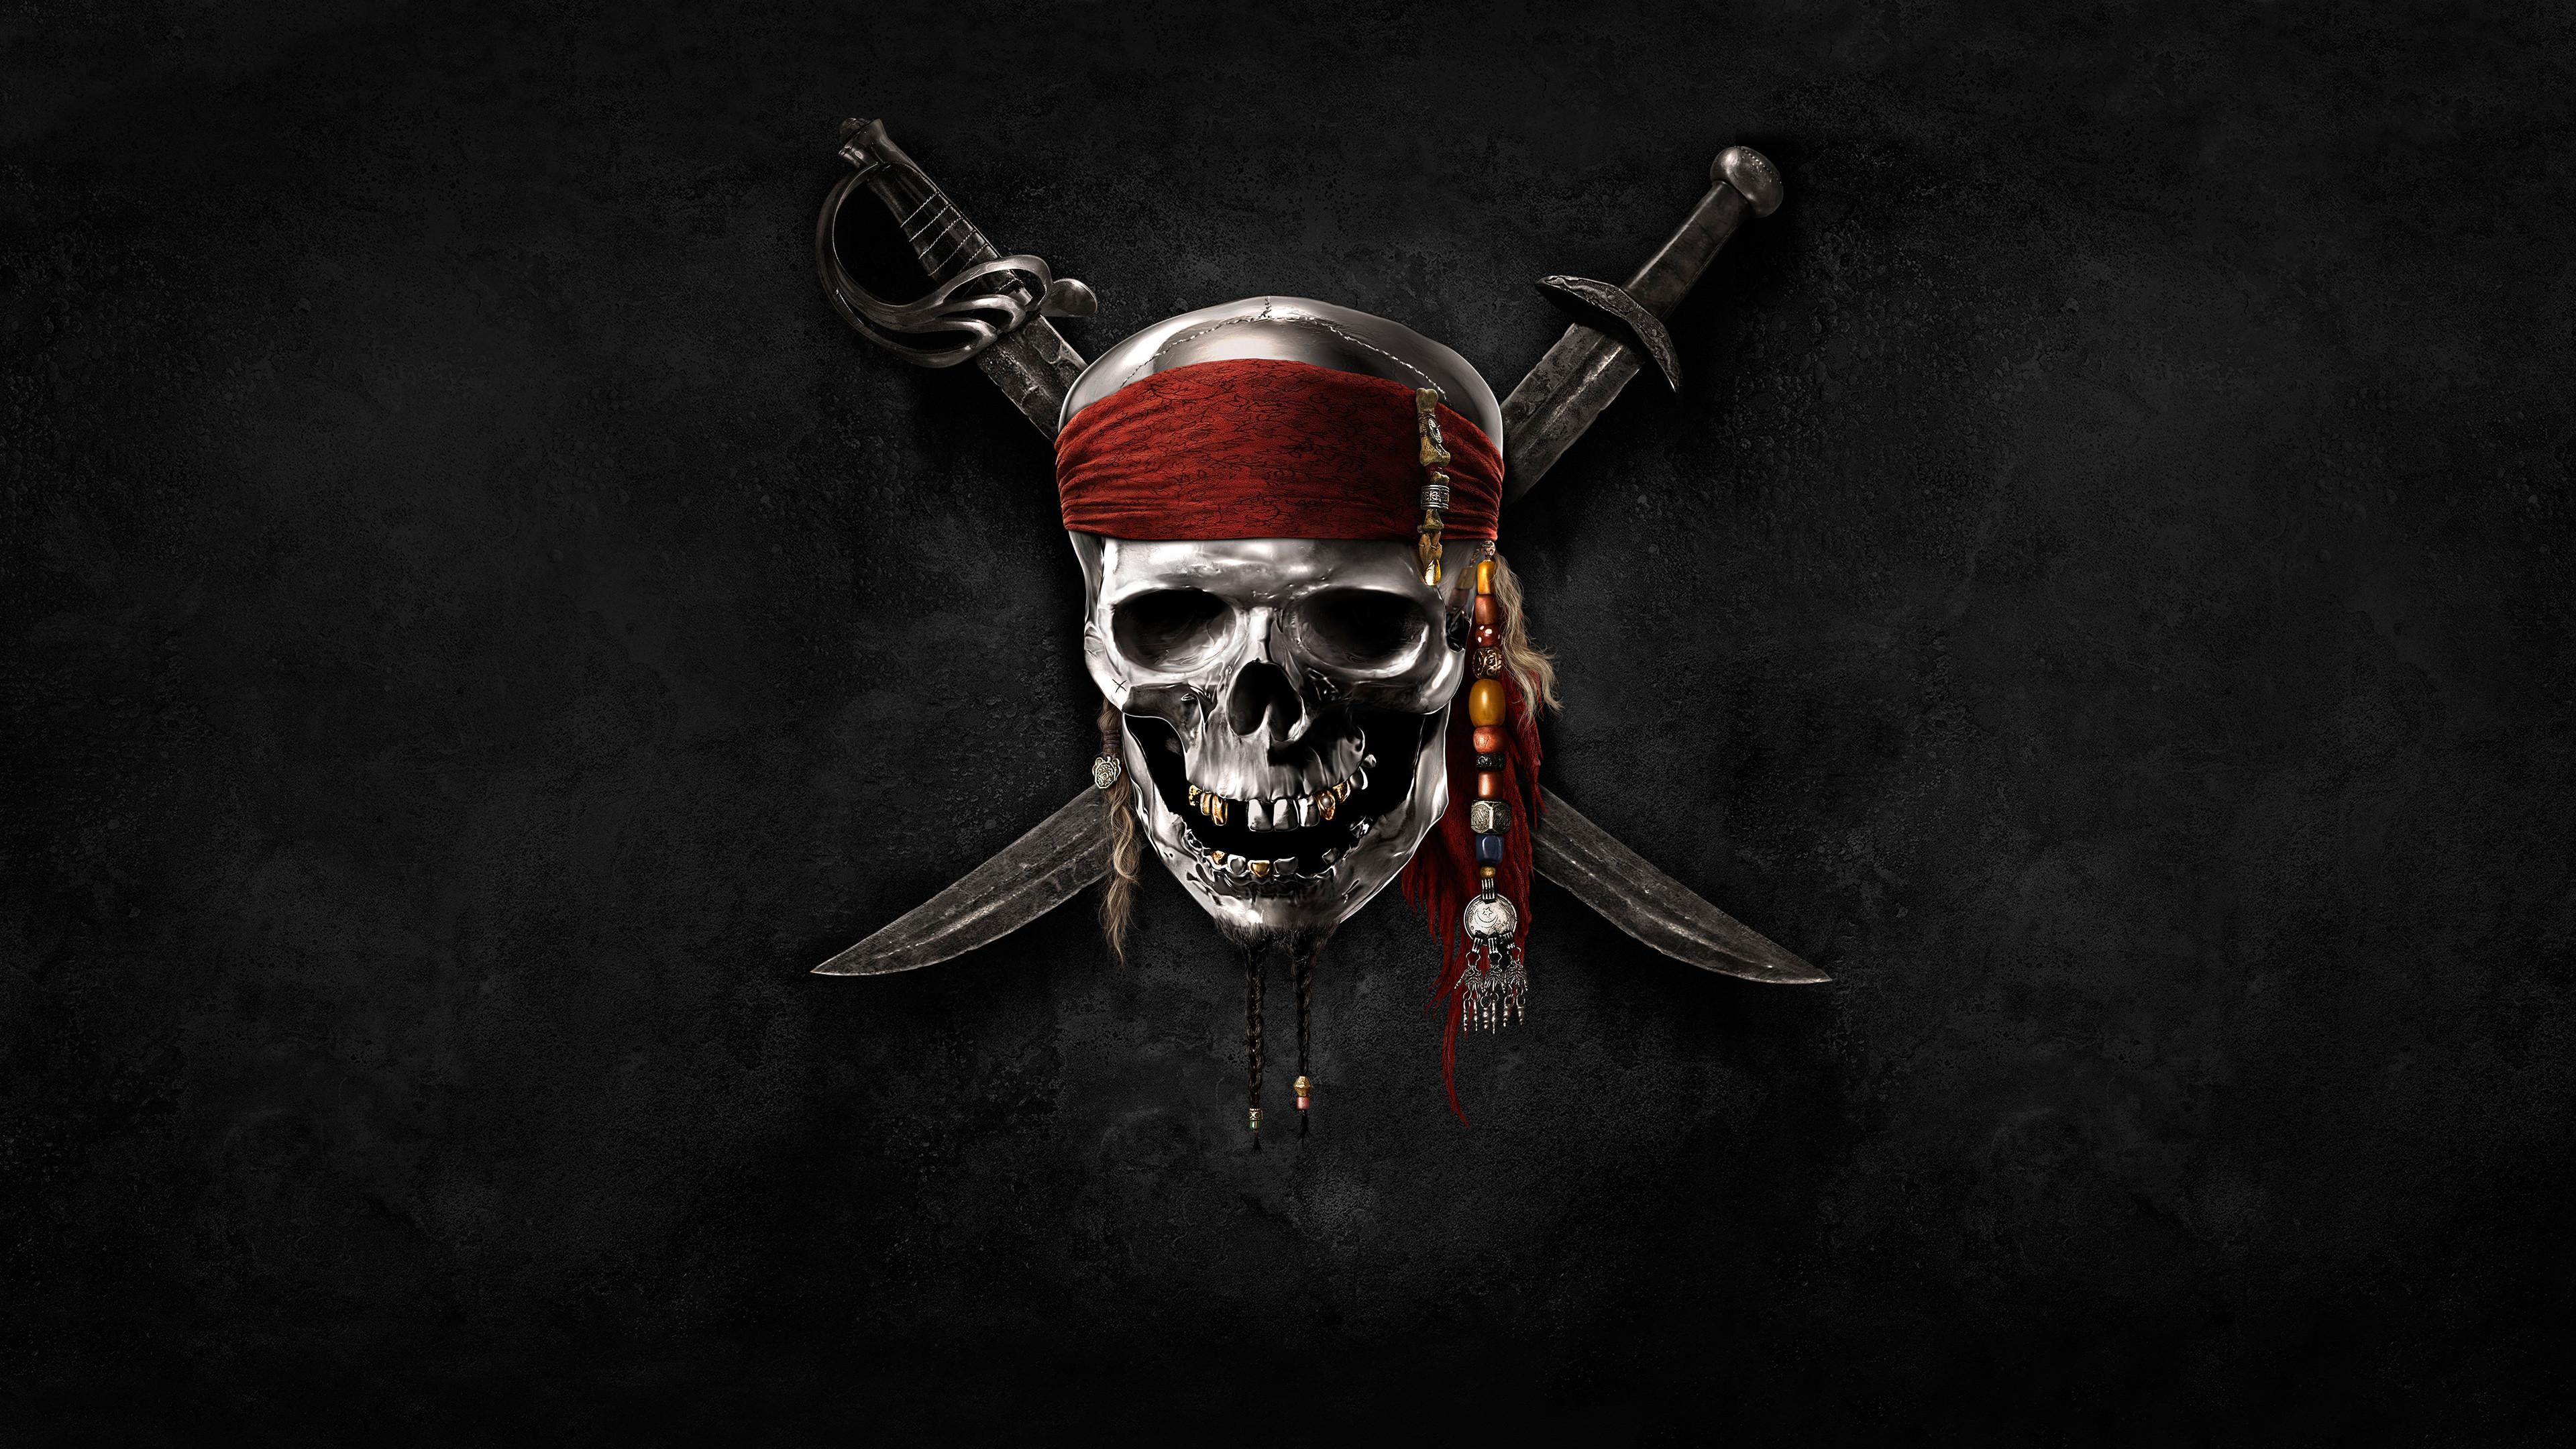 Res: 3840x2160, Pirate Wallpaper